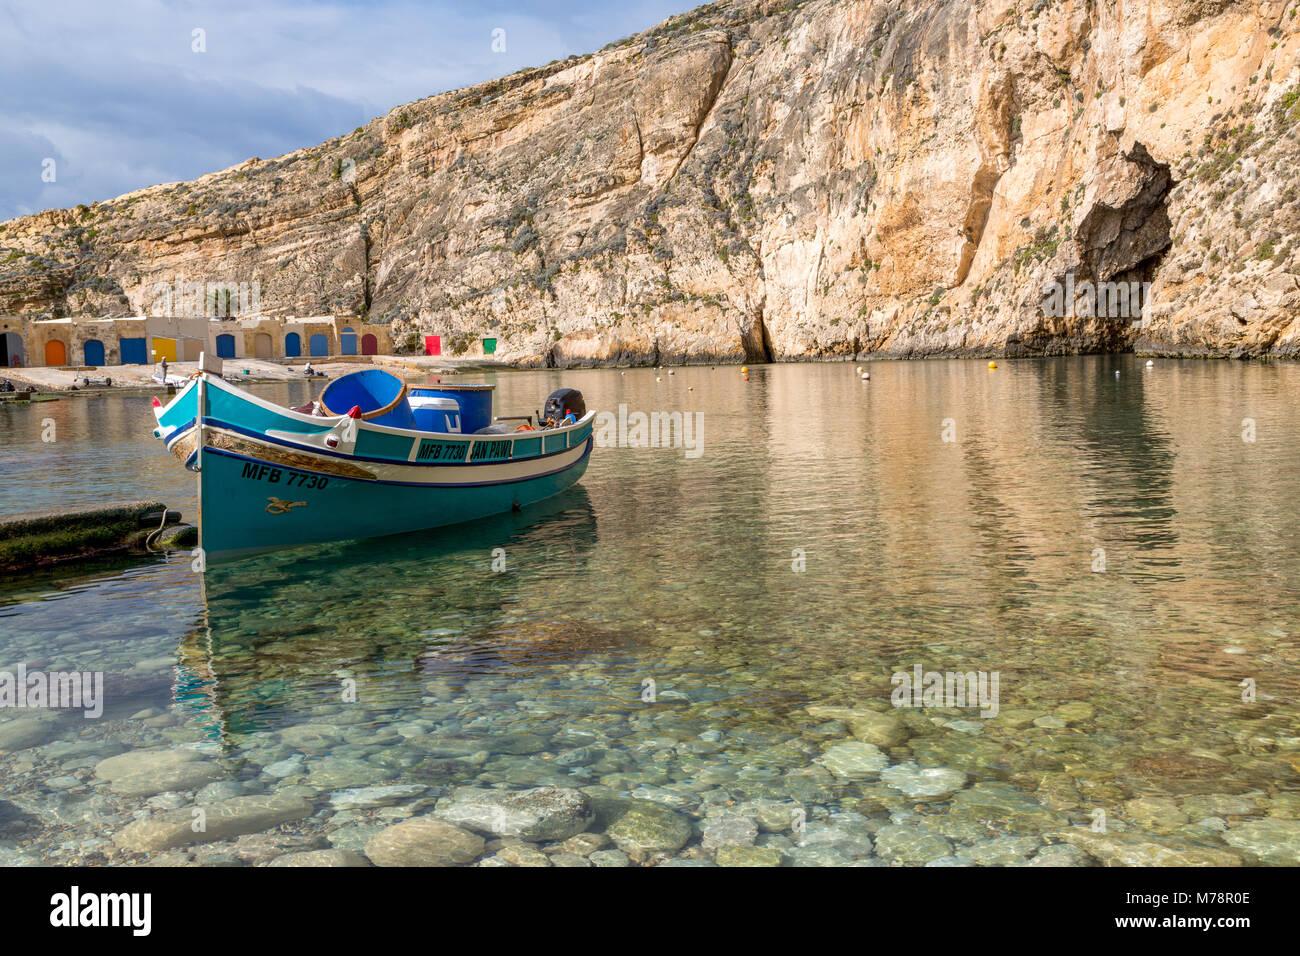 Traditionelle Boot im Hafen von Dwejra Binnenmeer in Gozo, Malta, Mittelmeer, Europa Stockbild